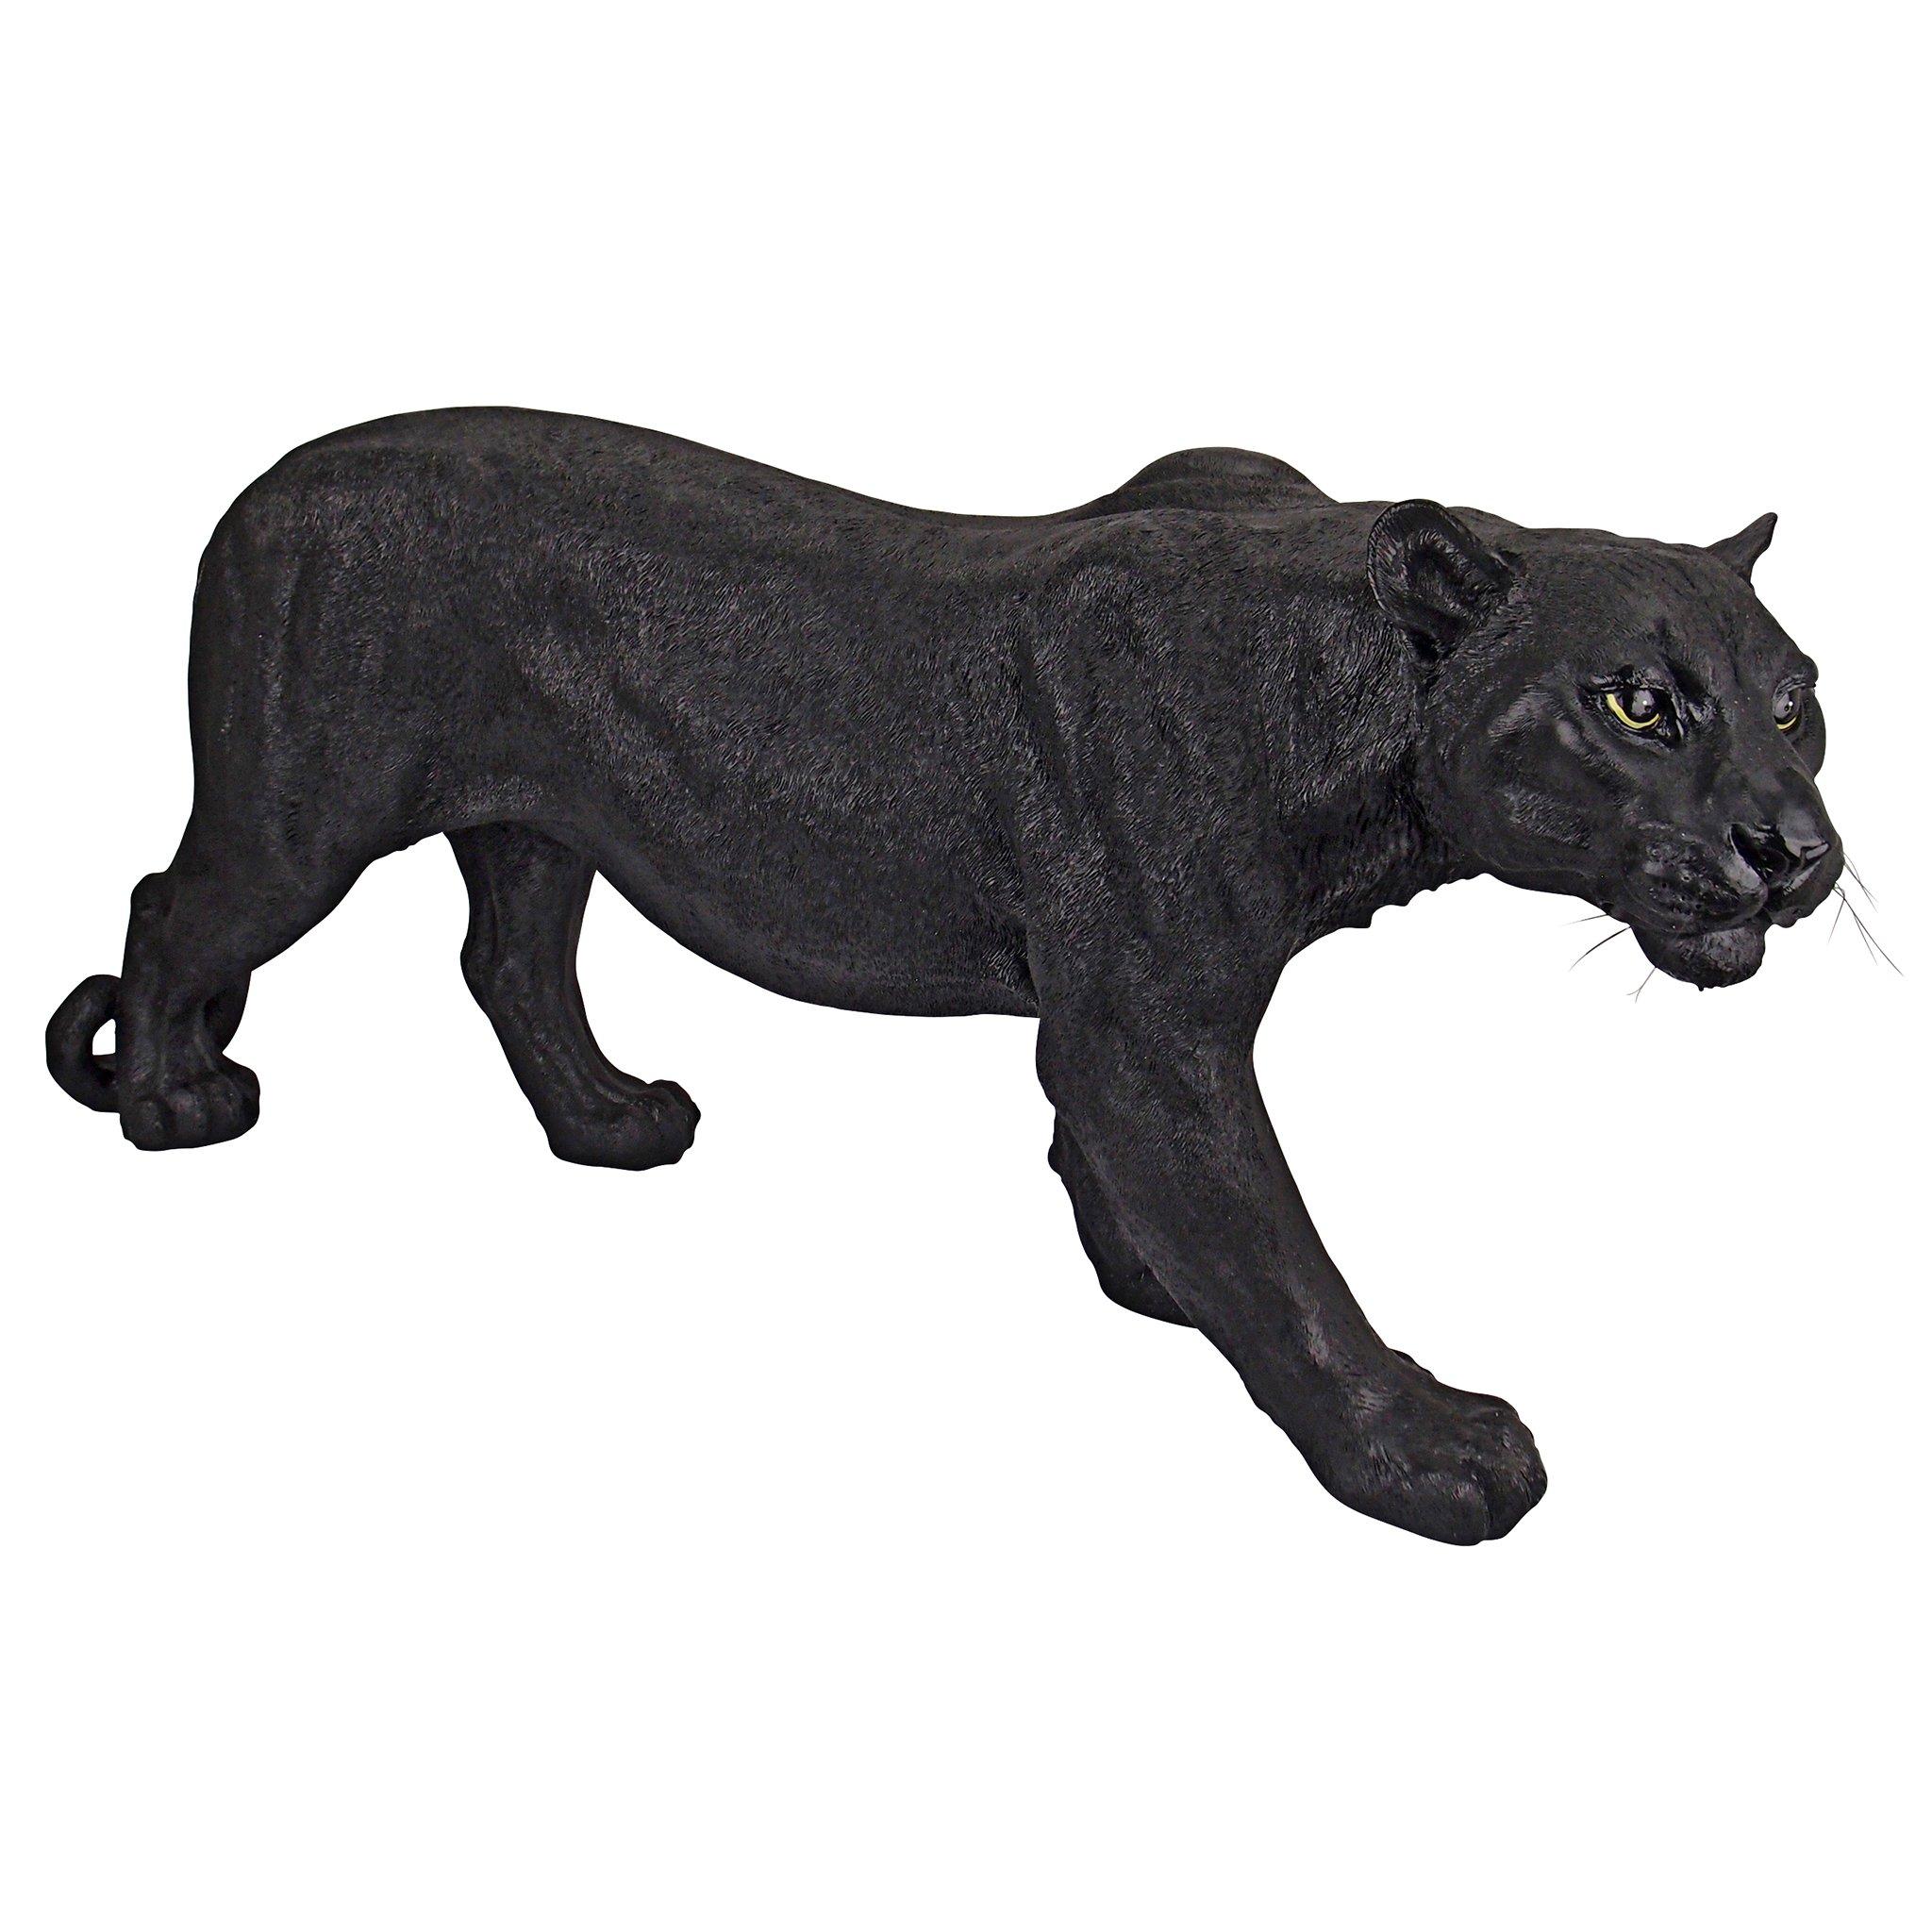 Design Toscano Shadowed Predator Black Panther Garden Statue, Large